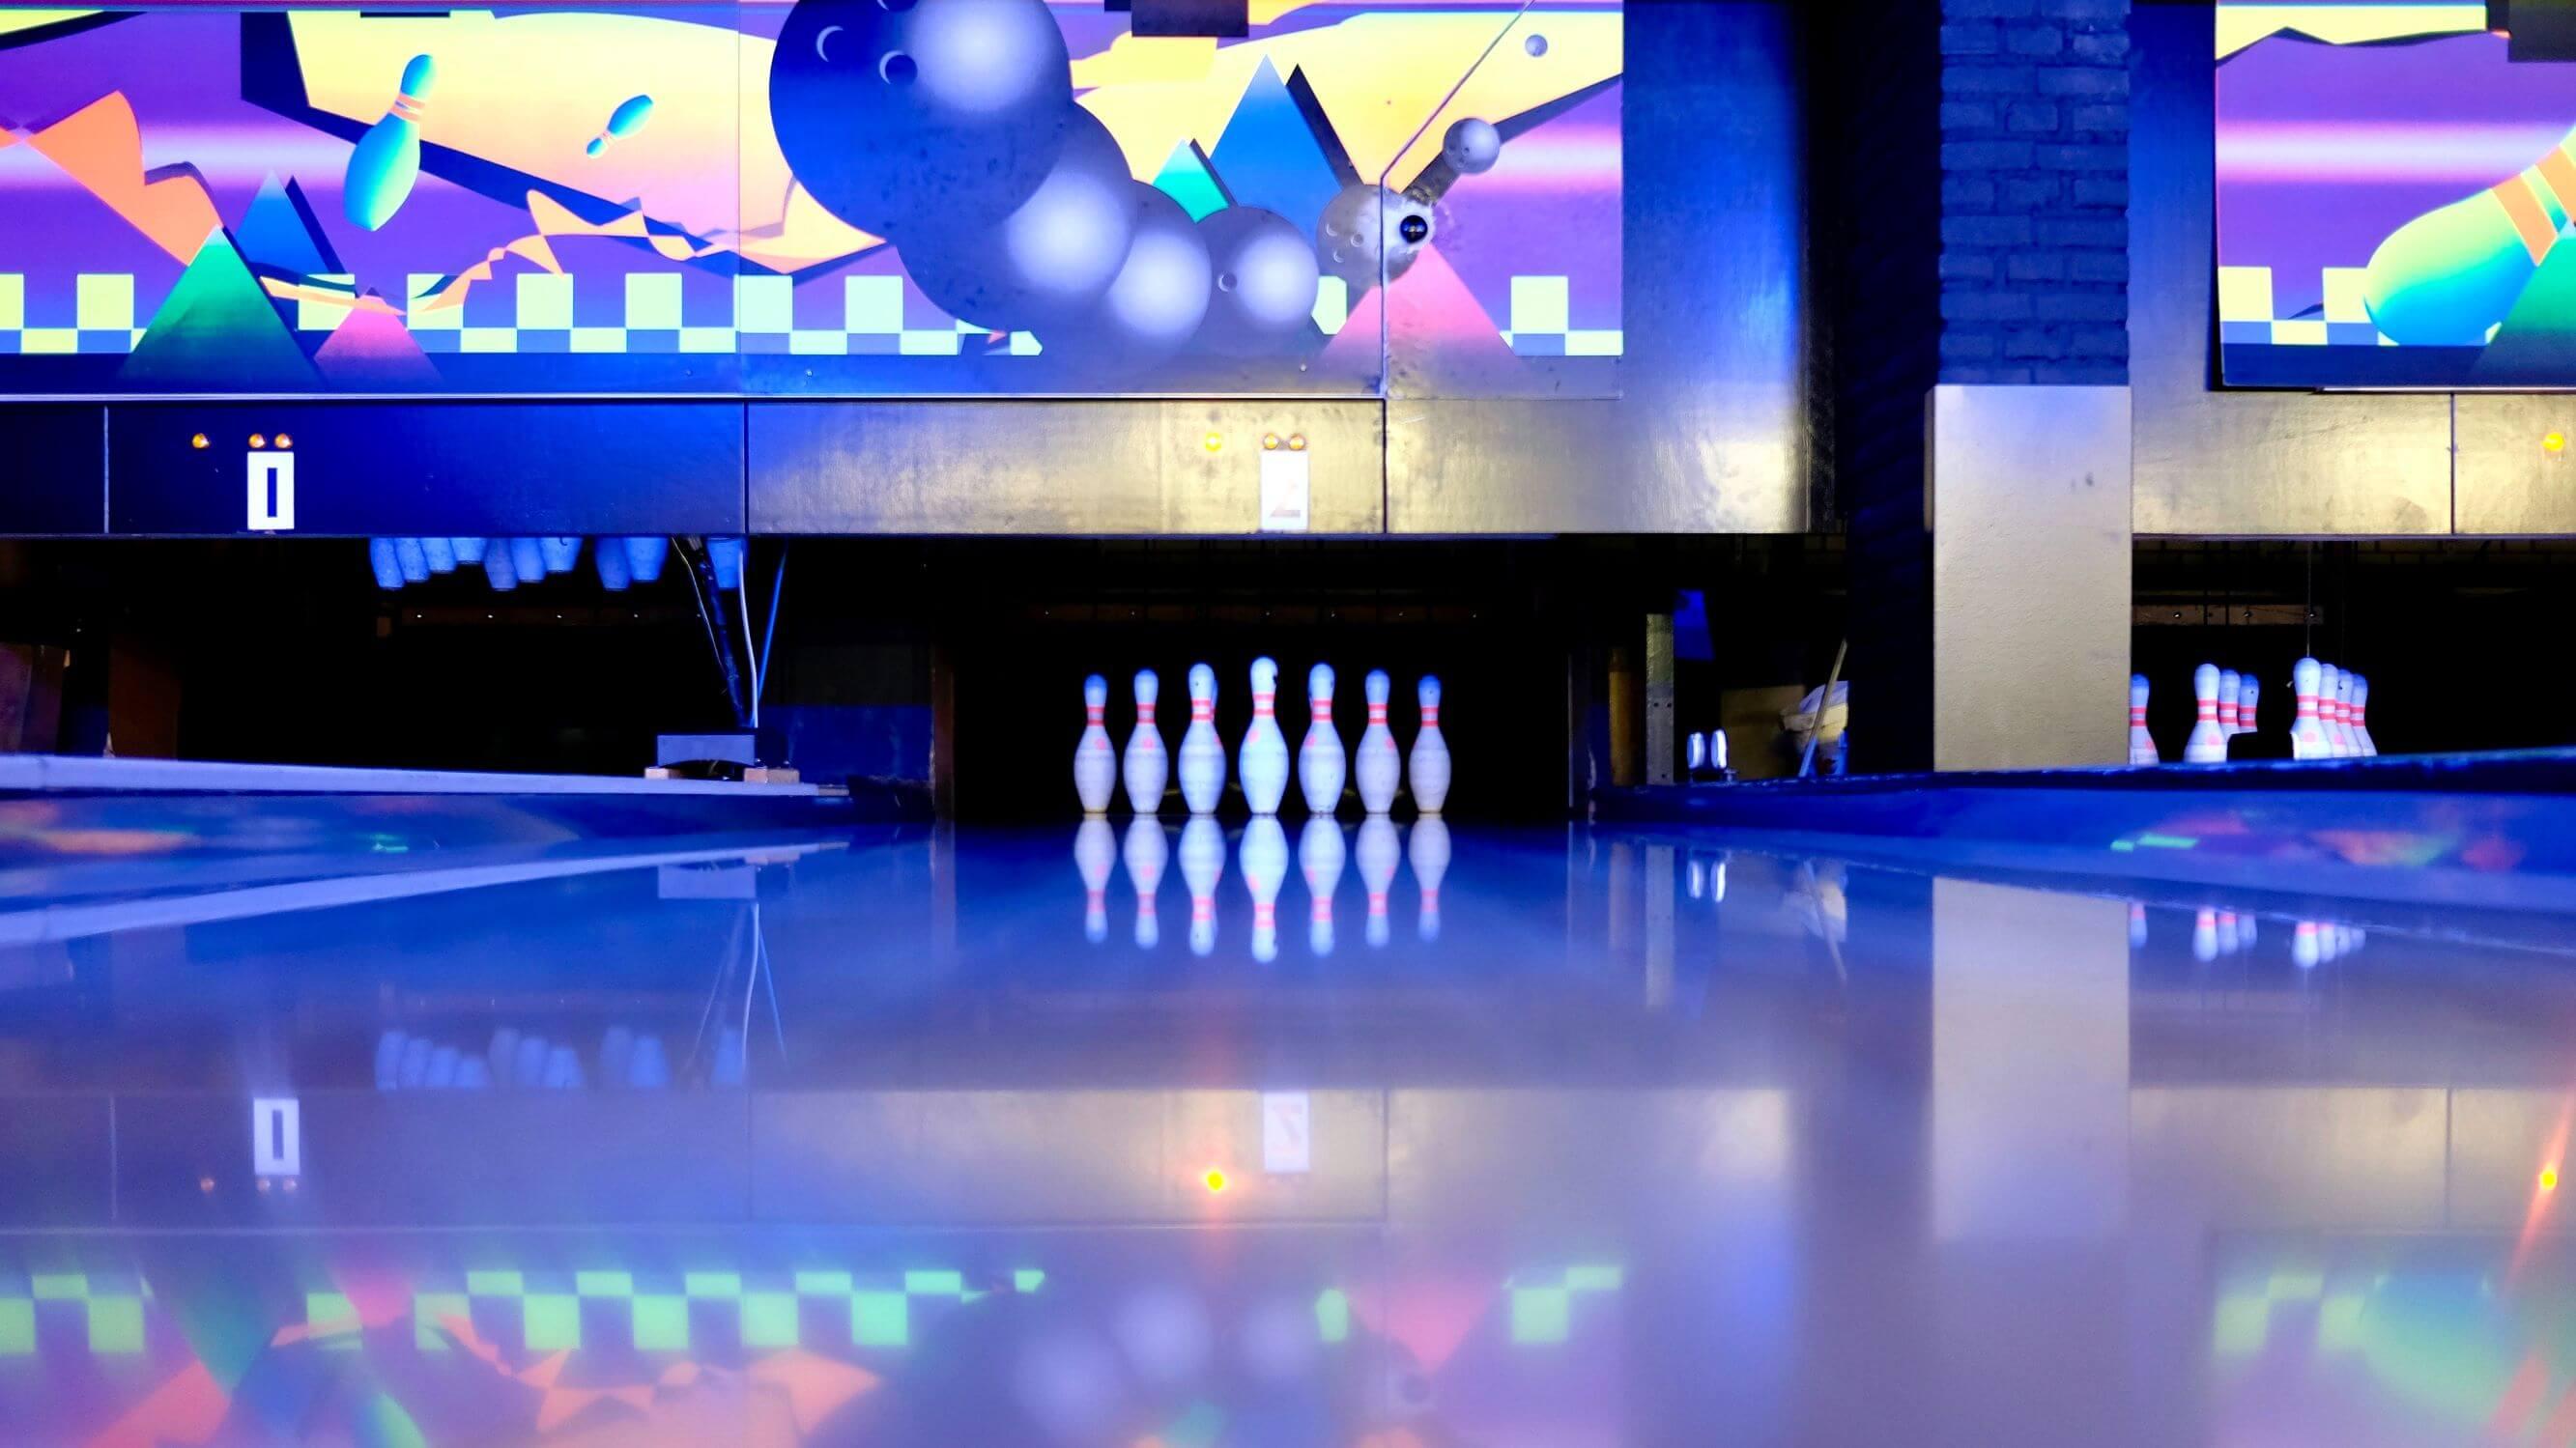 Buddy's bowling & diner arrangement